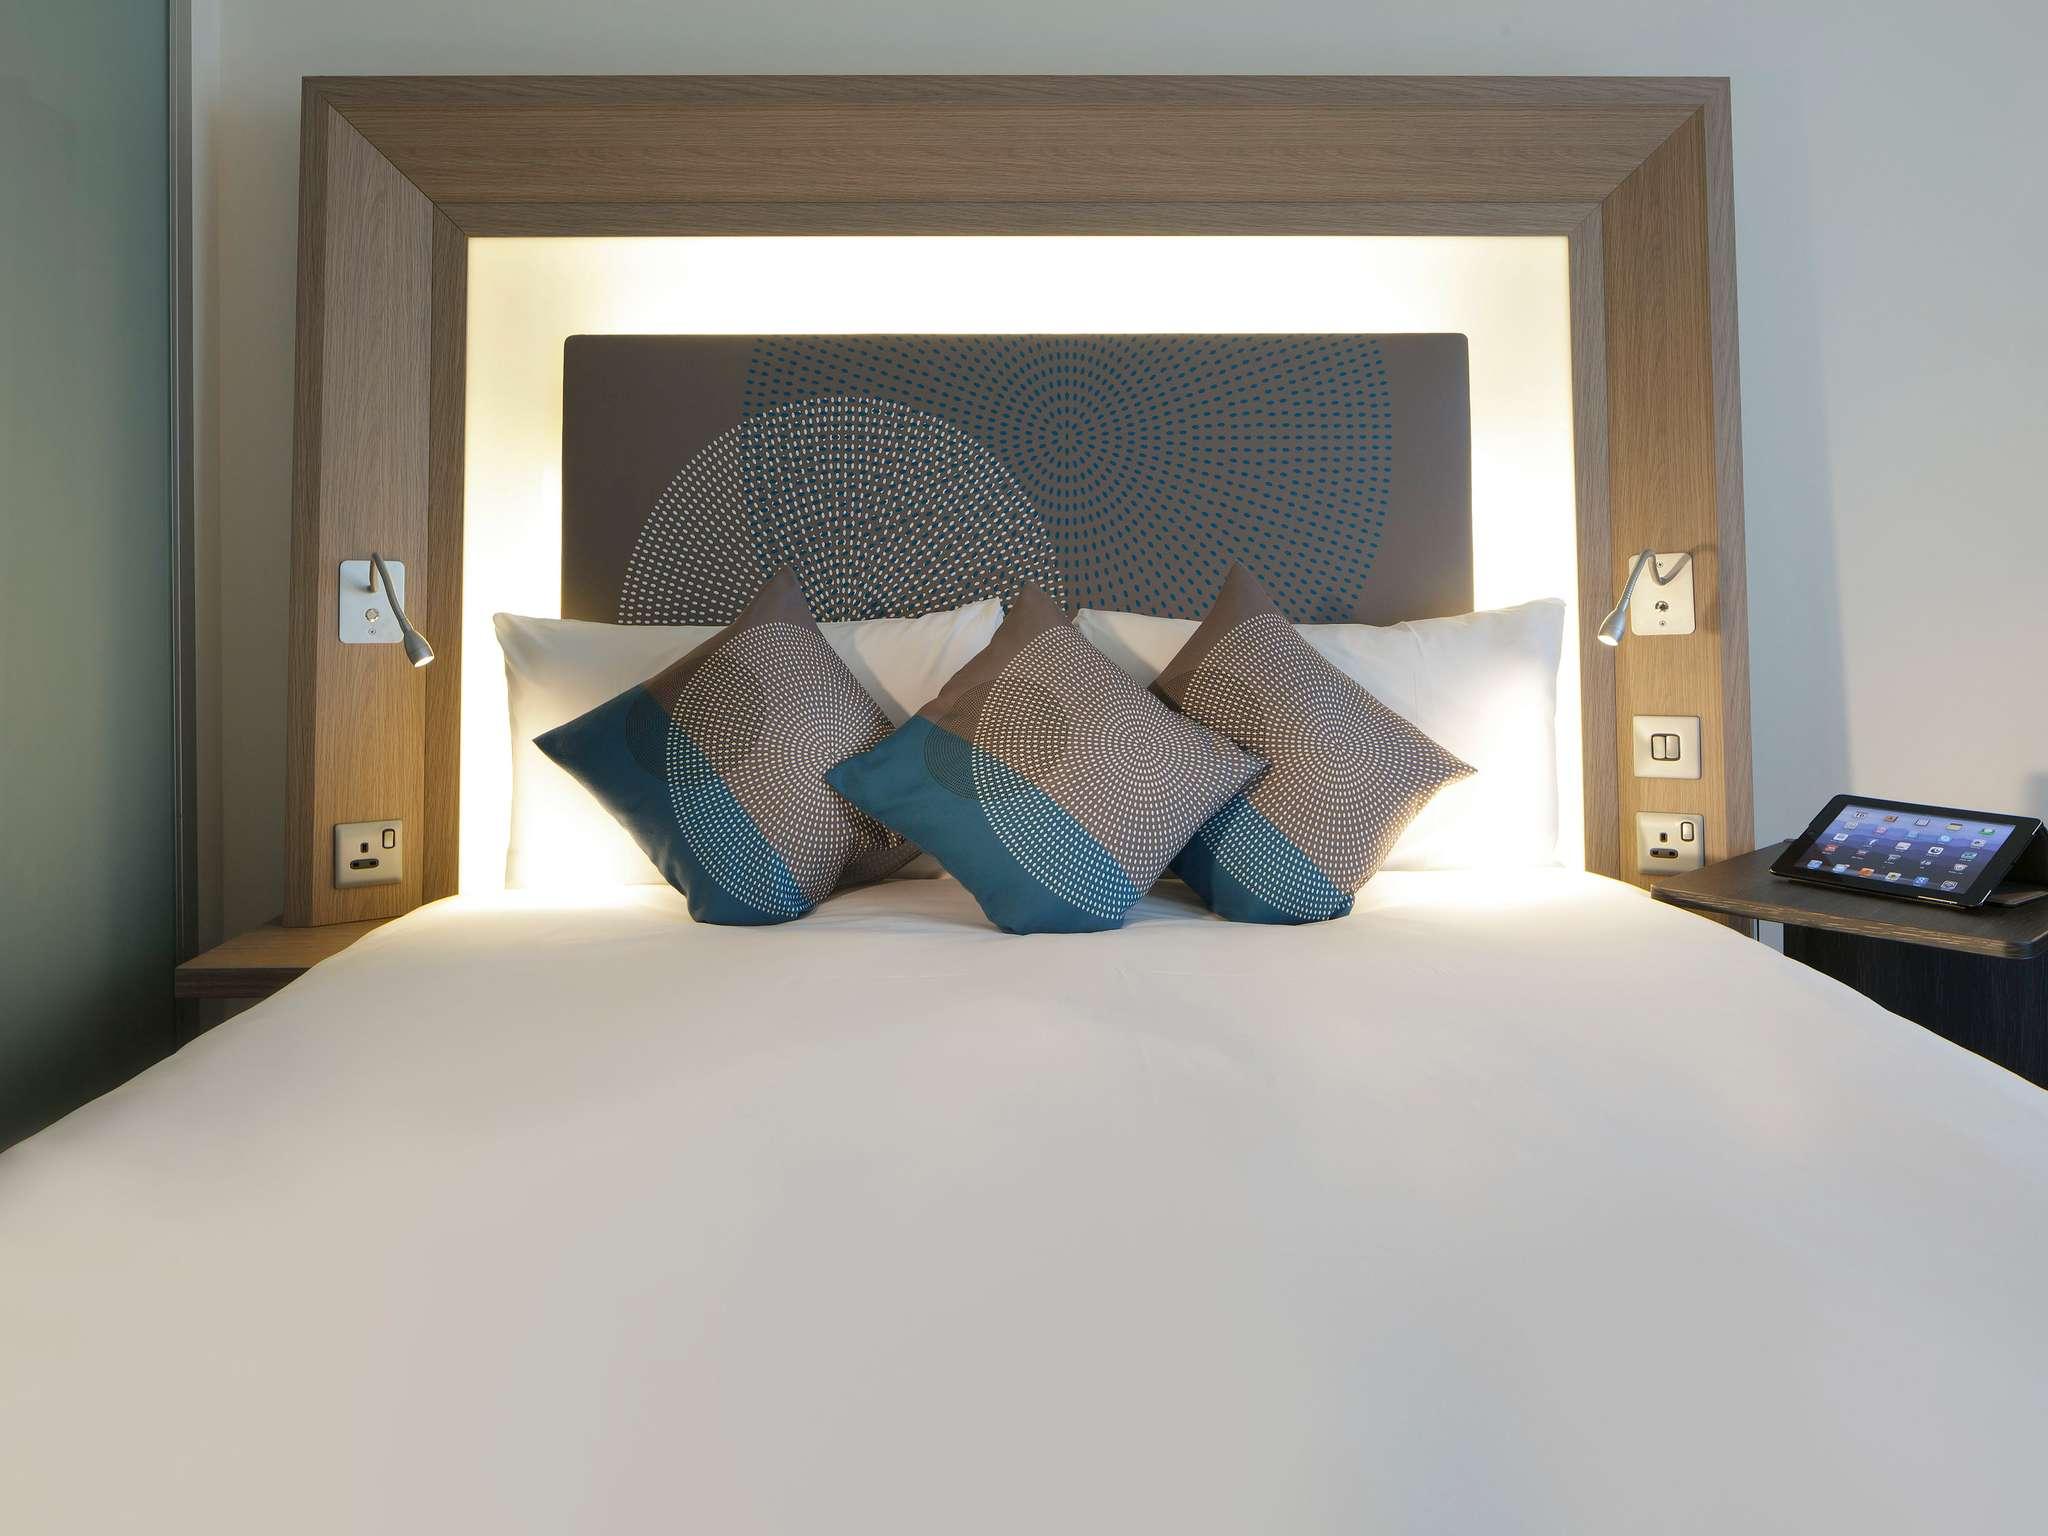 Novotel London Brentford | Relaxing Hotel in Brentford